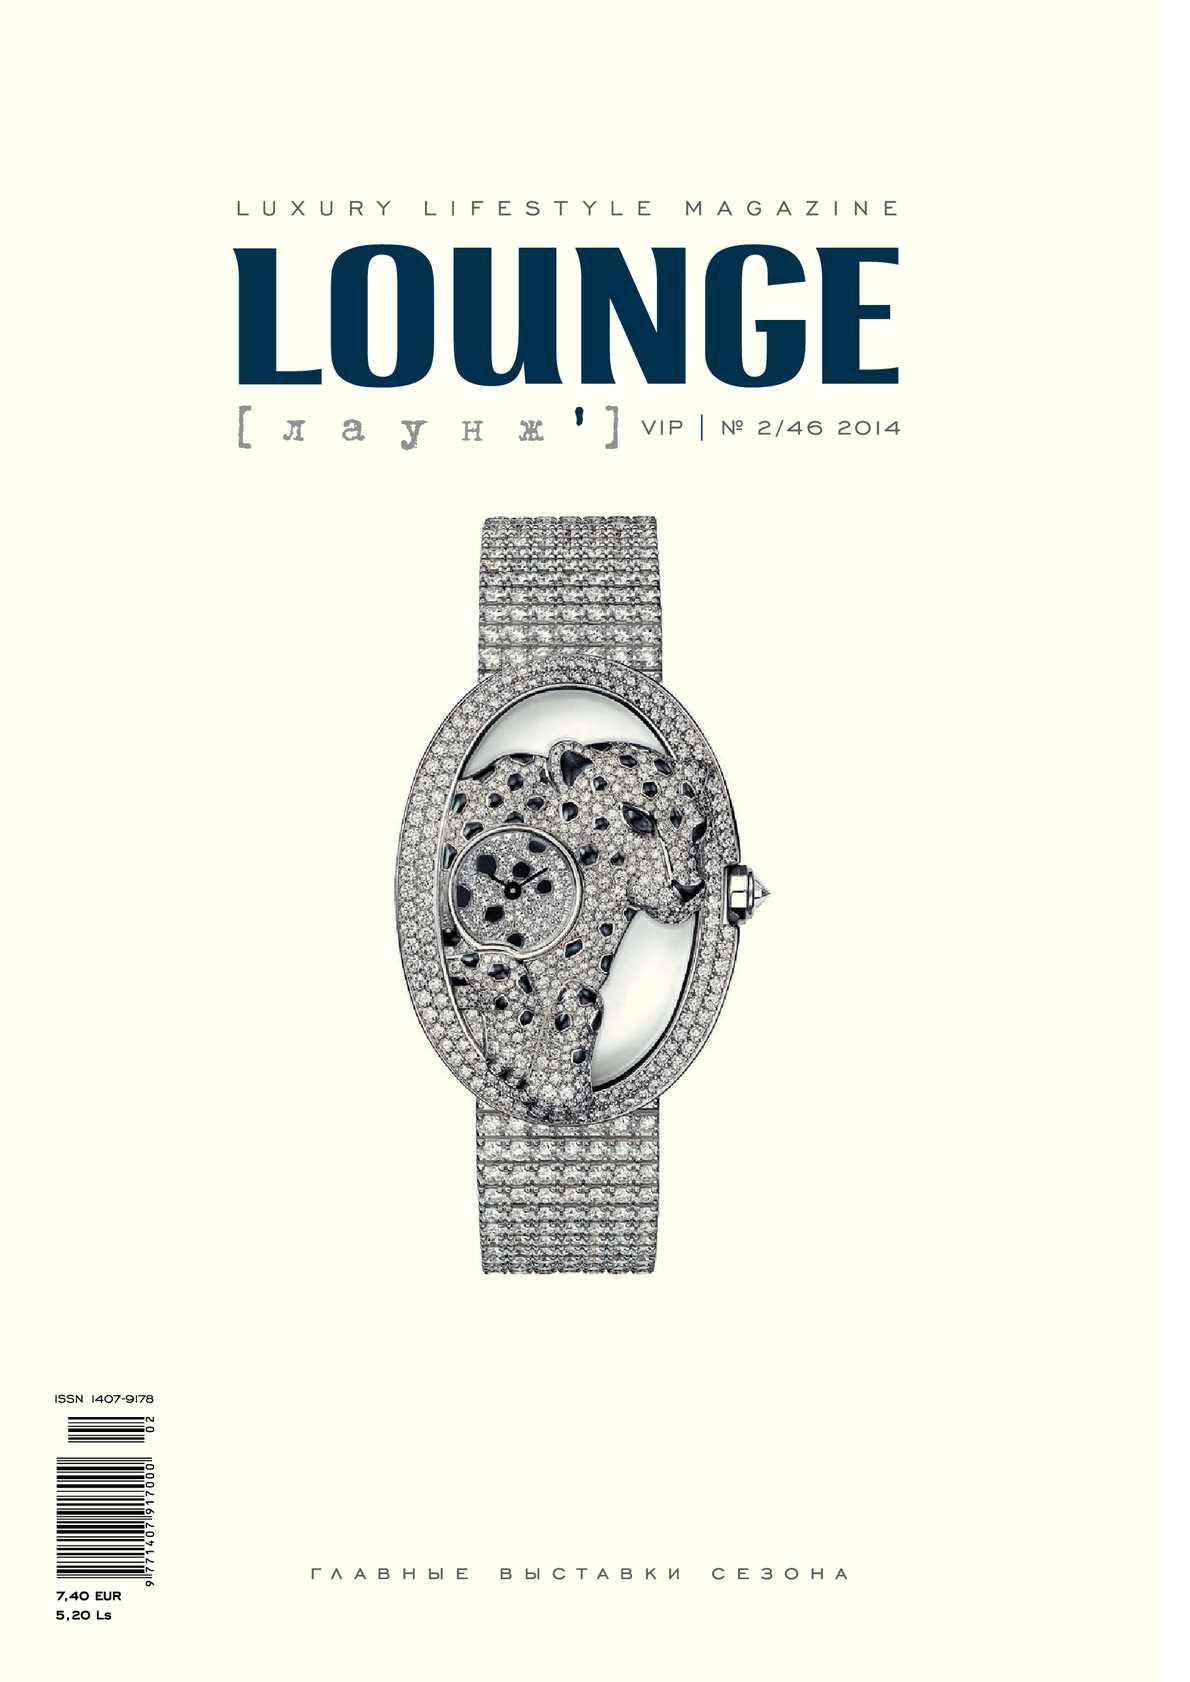 c4ad069c962f Calaméo - Vip Lounge April 2014